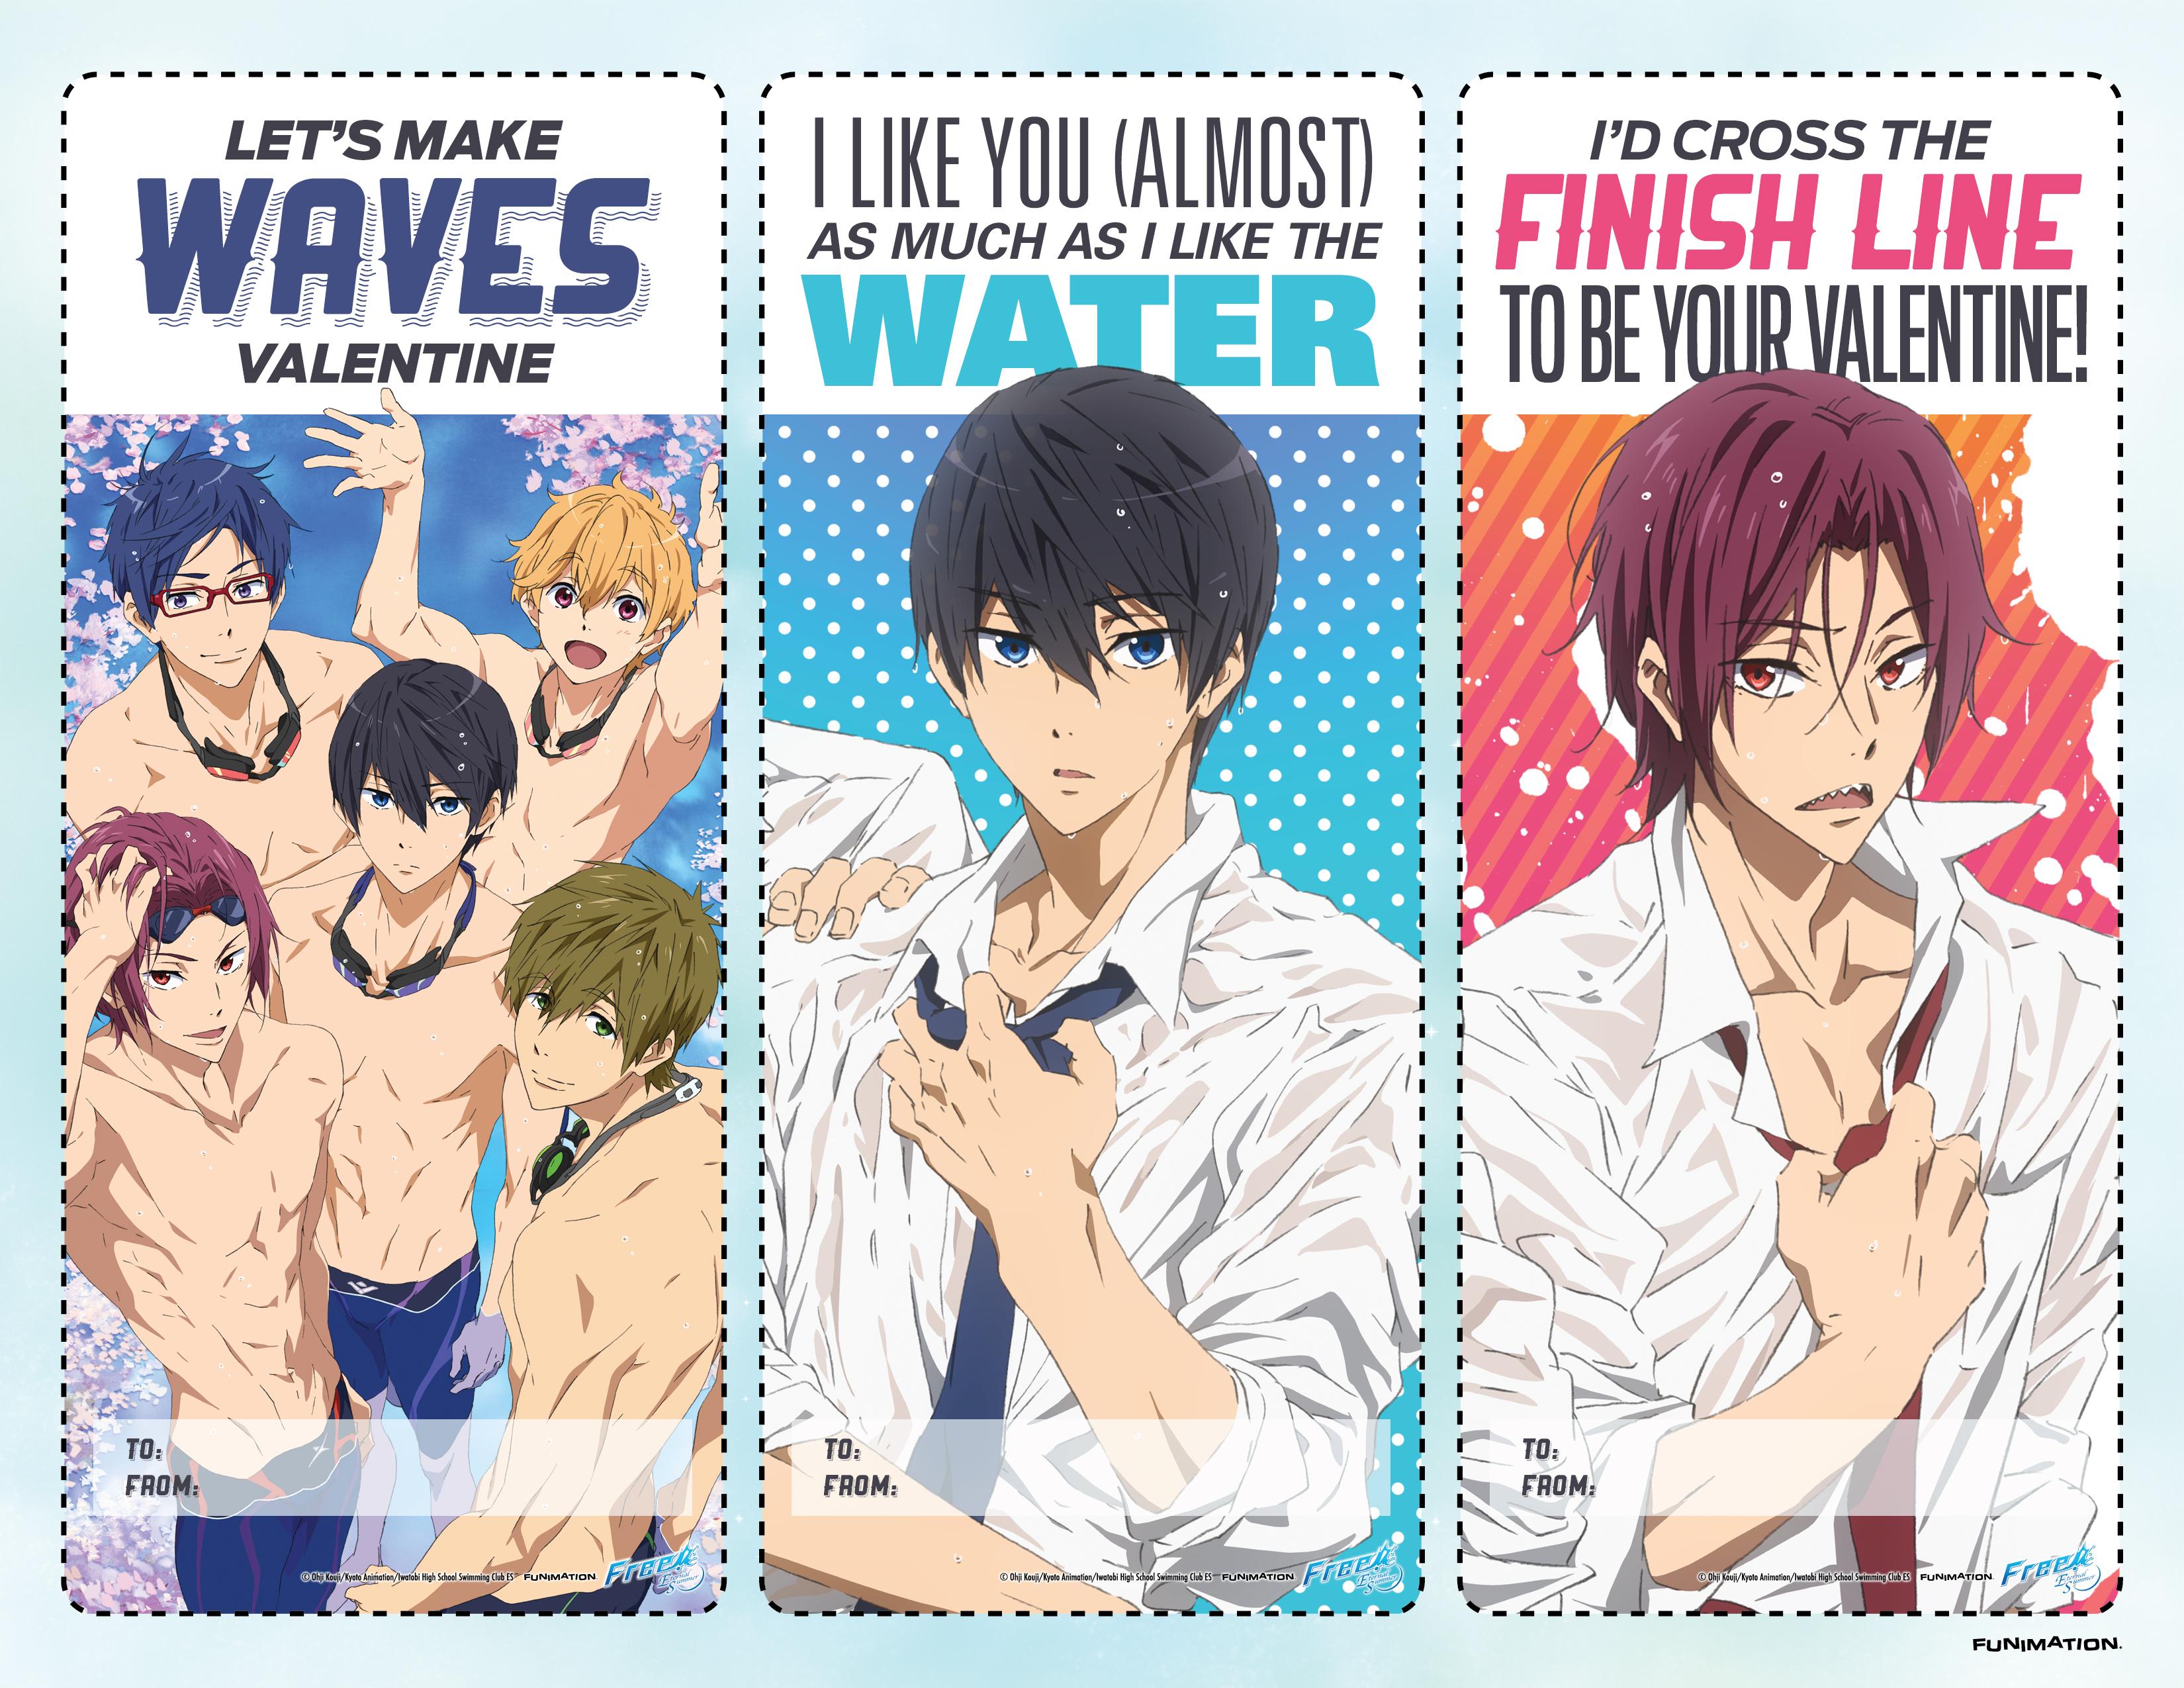 Anime Valentine's Day Cards haruhichan.com Free!